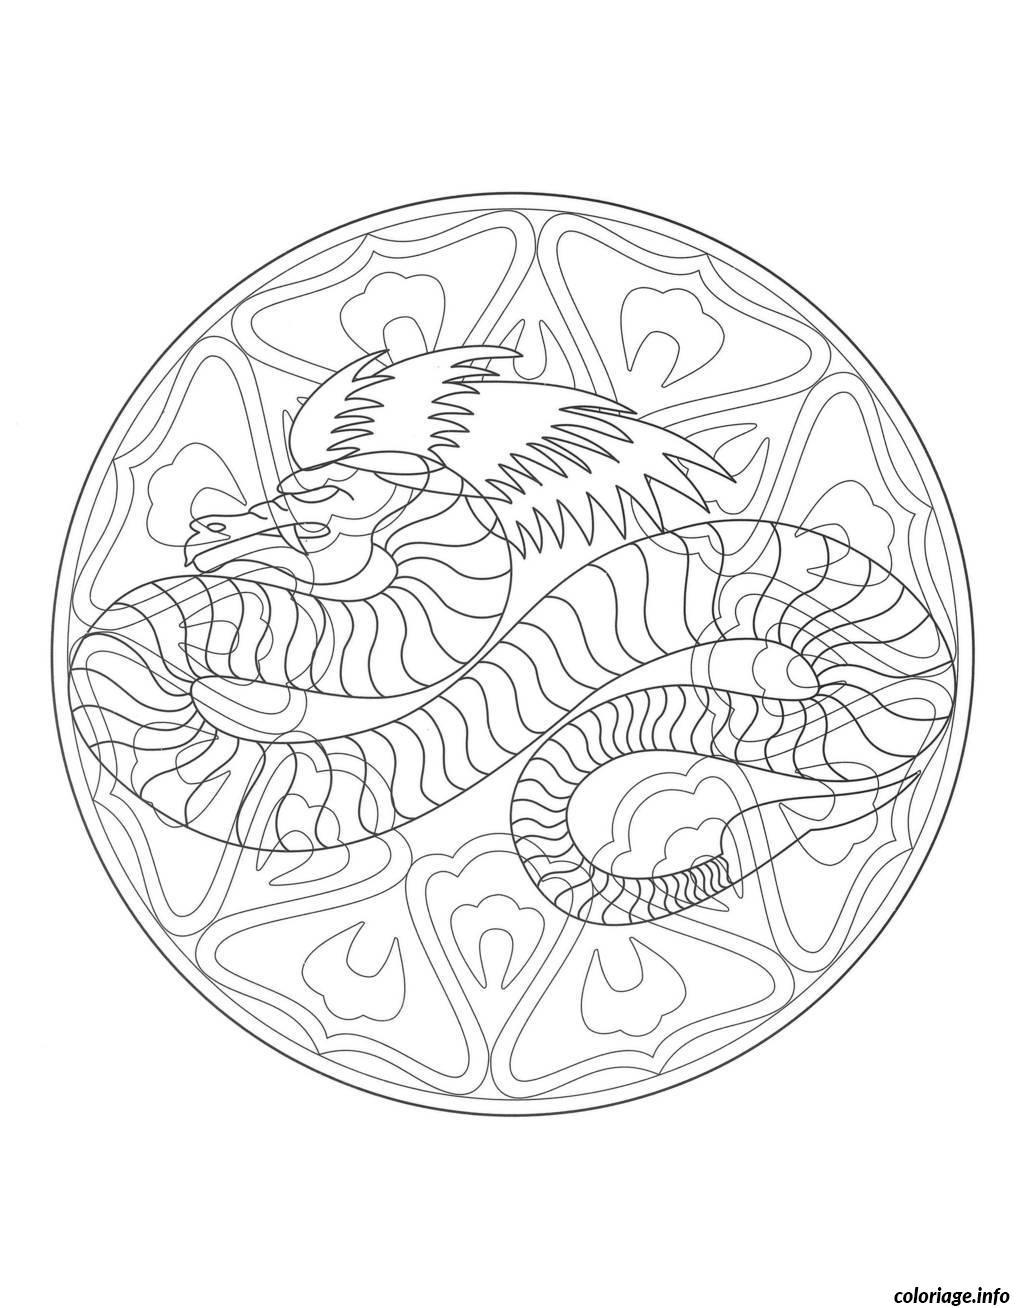 Coloriage coloring mandala dragon 4 dessin - Mandala dragon ...